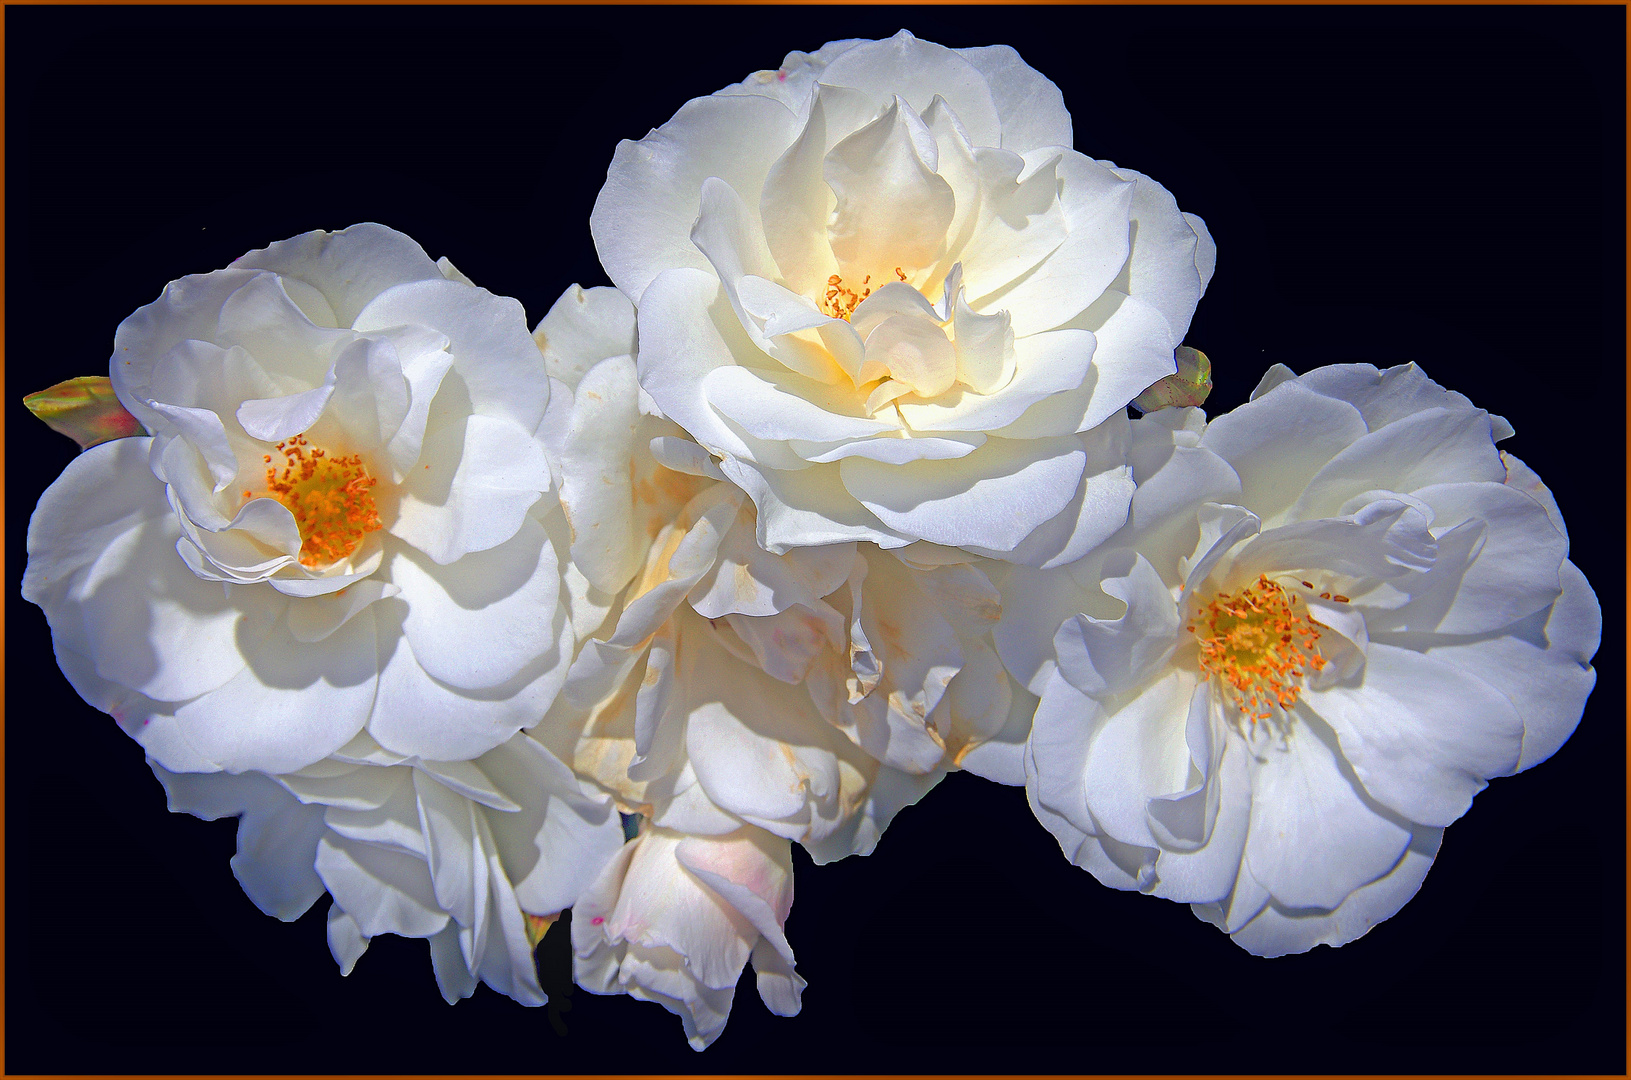 des roses comme haie....